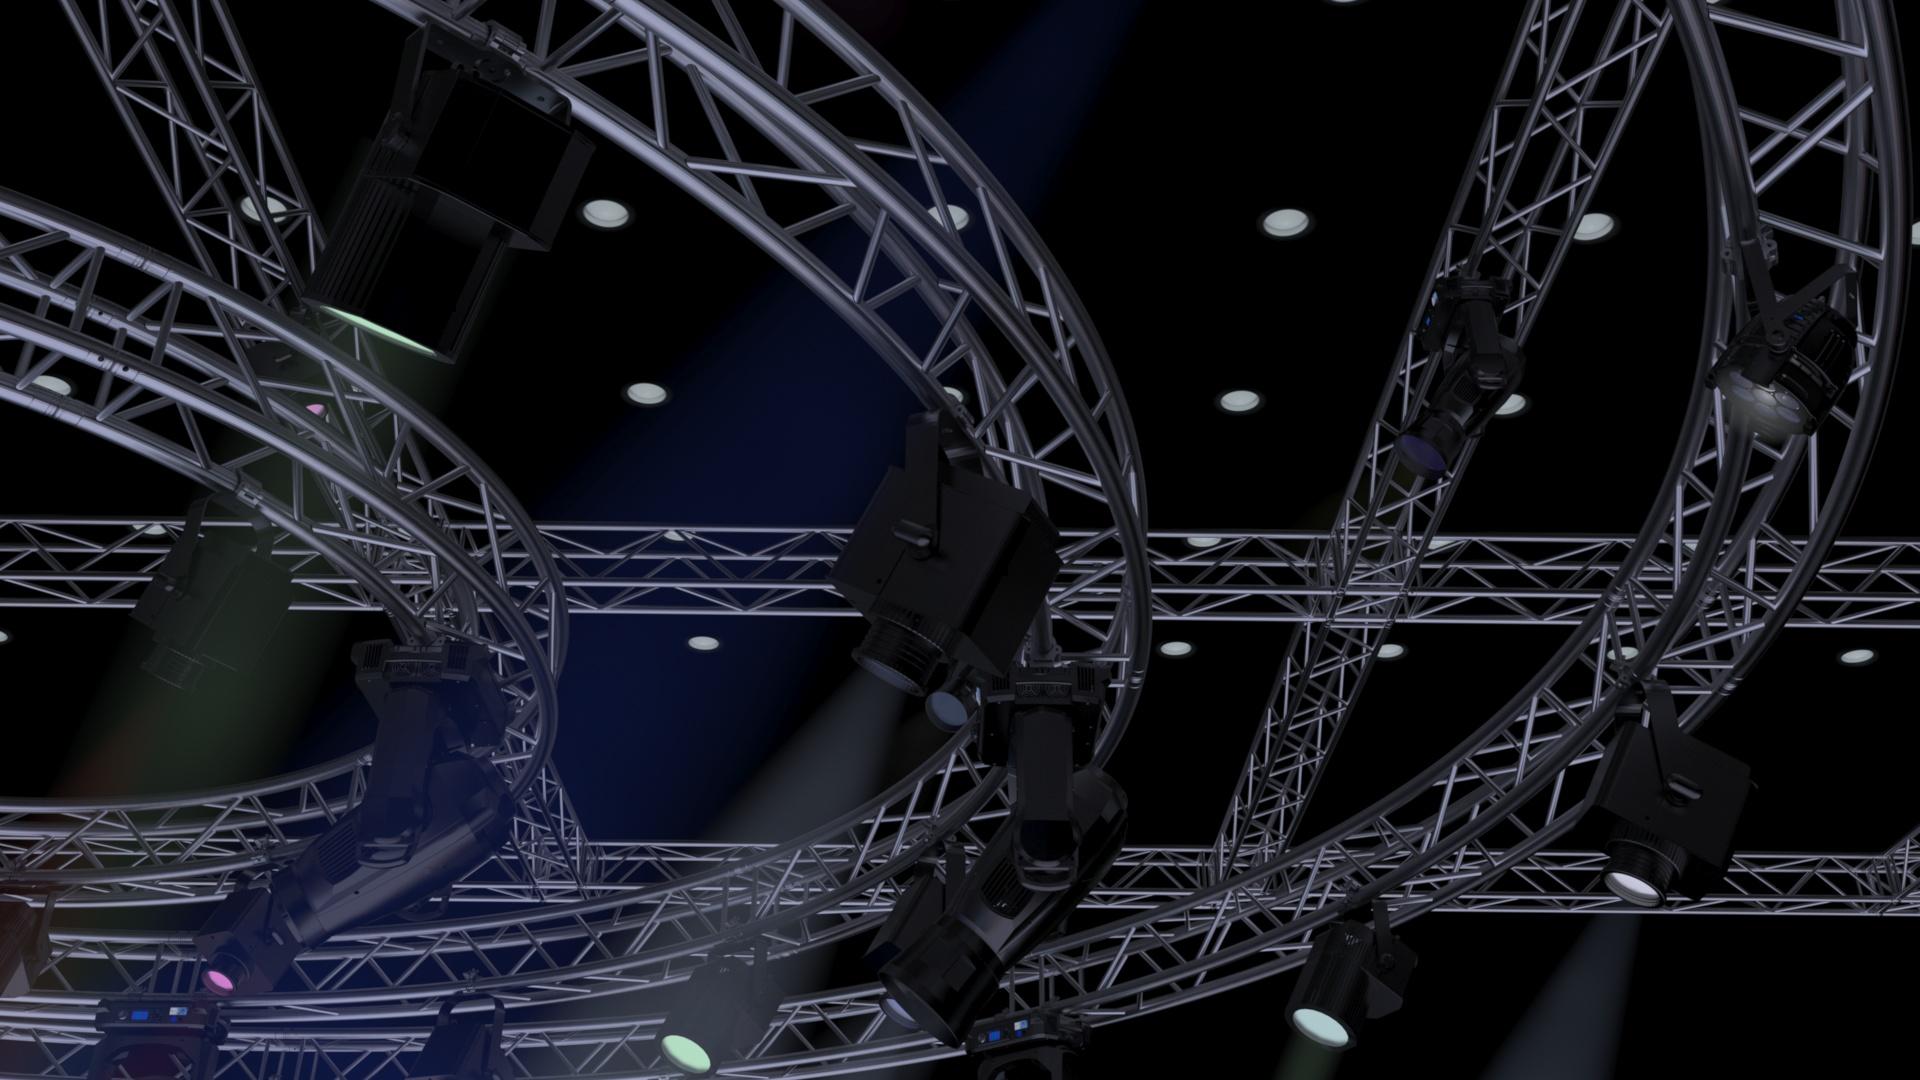 41-01-TVStudioStage-TrussLights-6